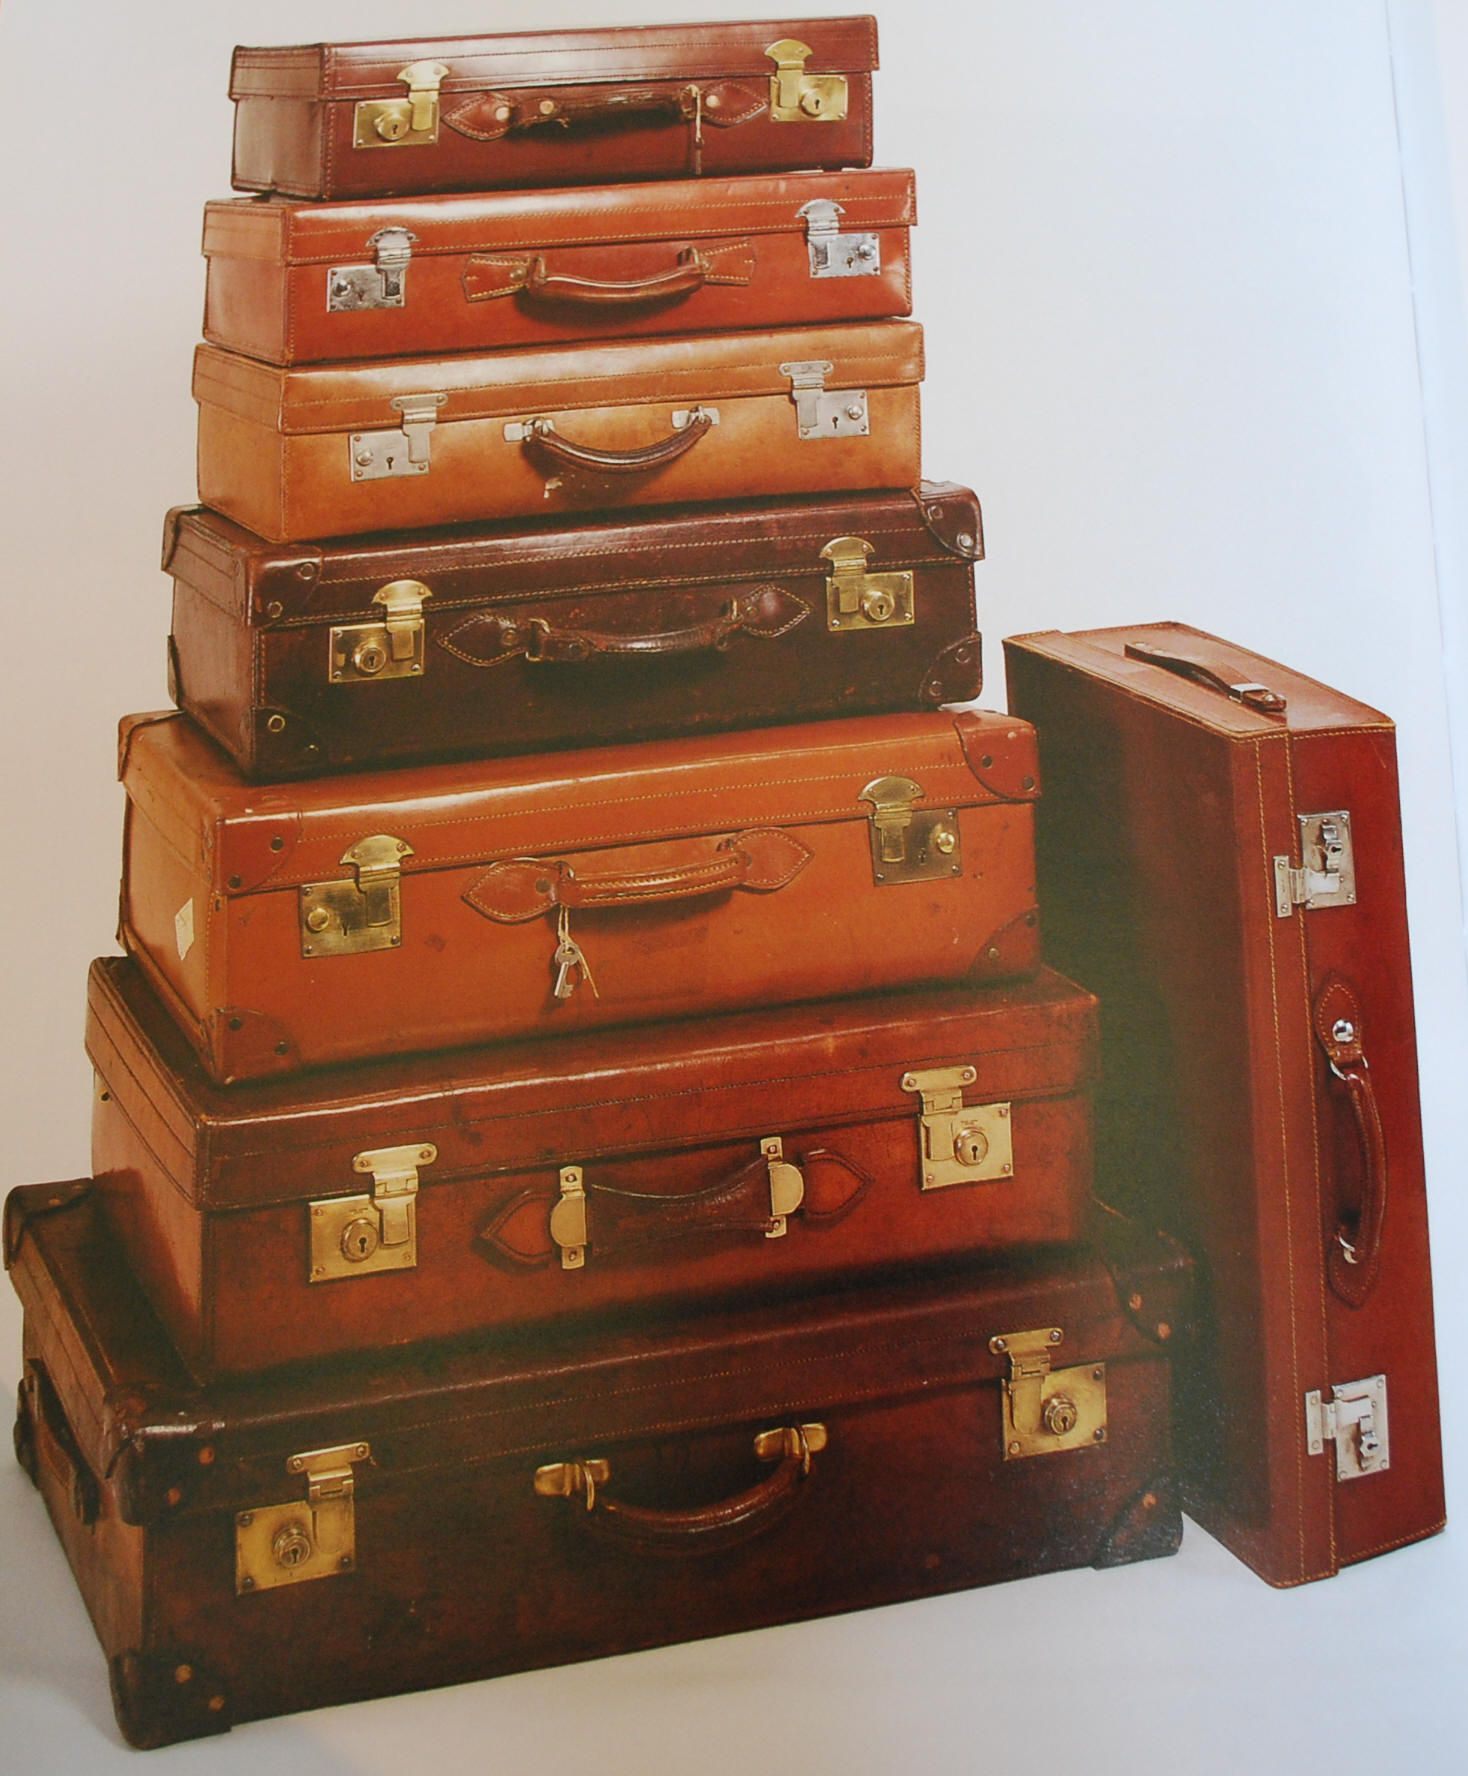 Vintage suitcases   Vintage   Pinterest   Vintage luggage ...